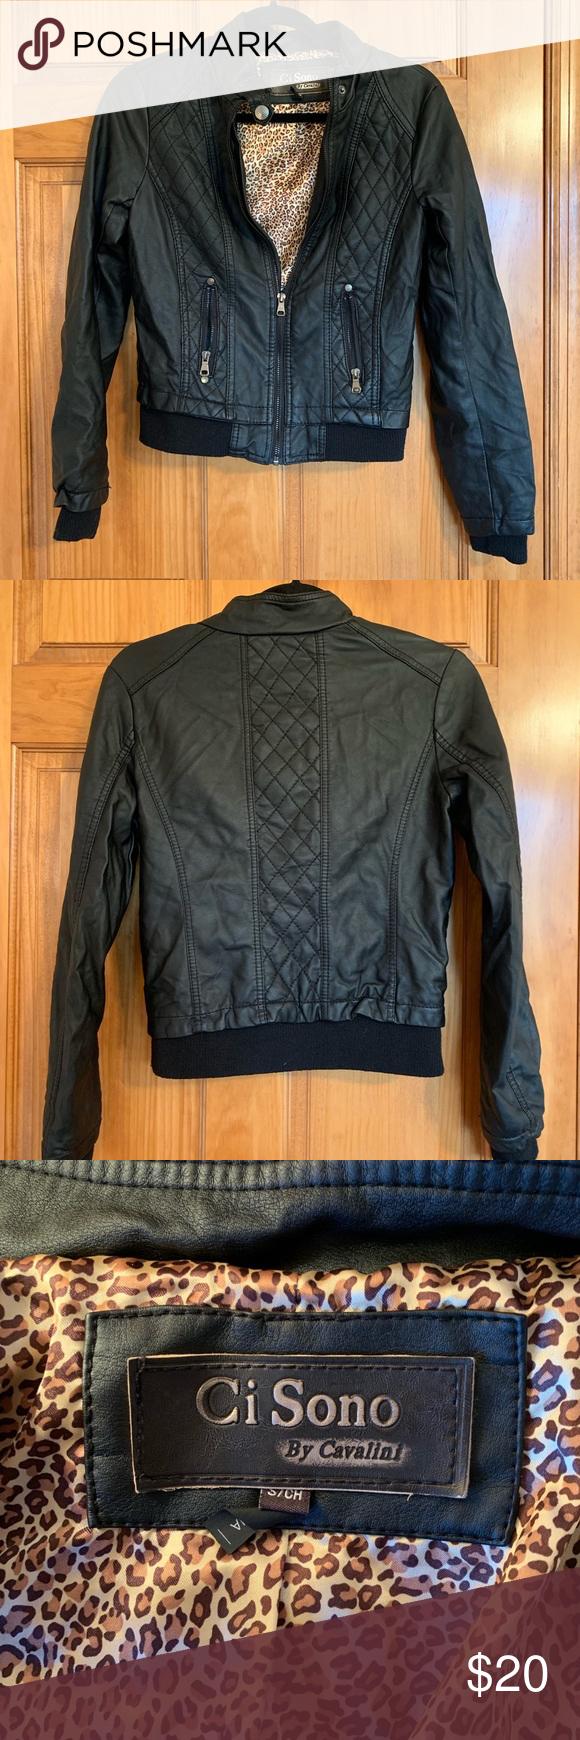 Ci Sono By Cavalini Bomber Jacket Women S S Bomber Jacket Women Faux Leather Bomber Jacket Jackets For Women